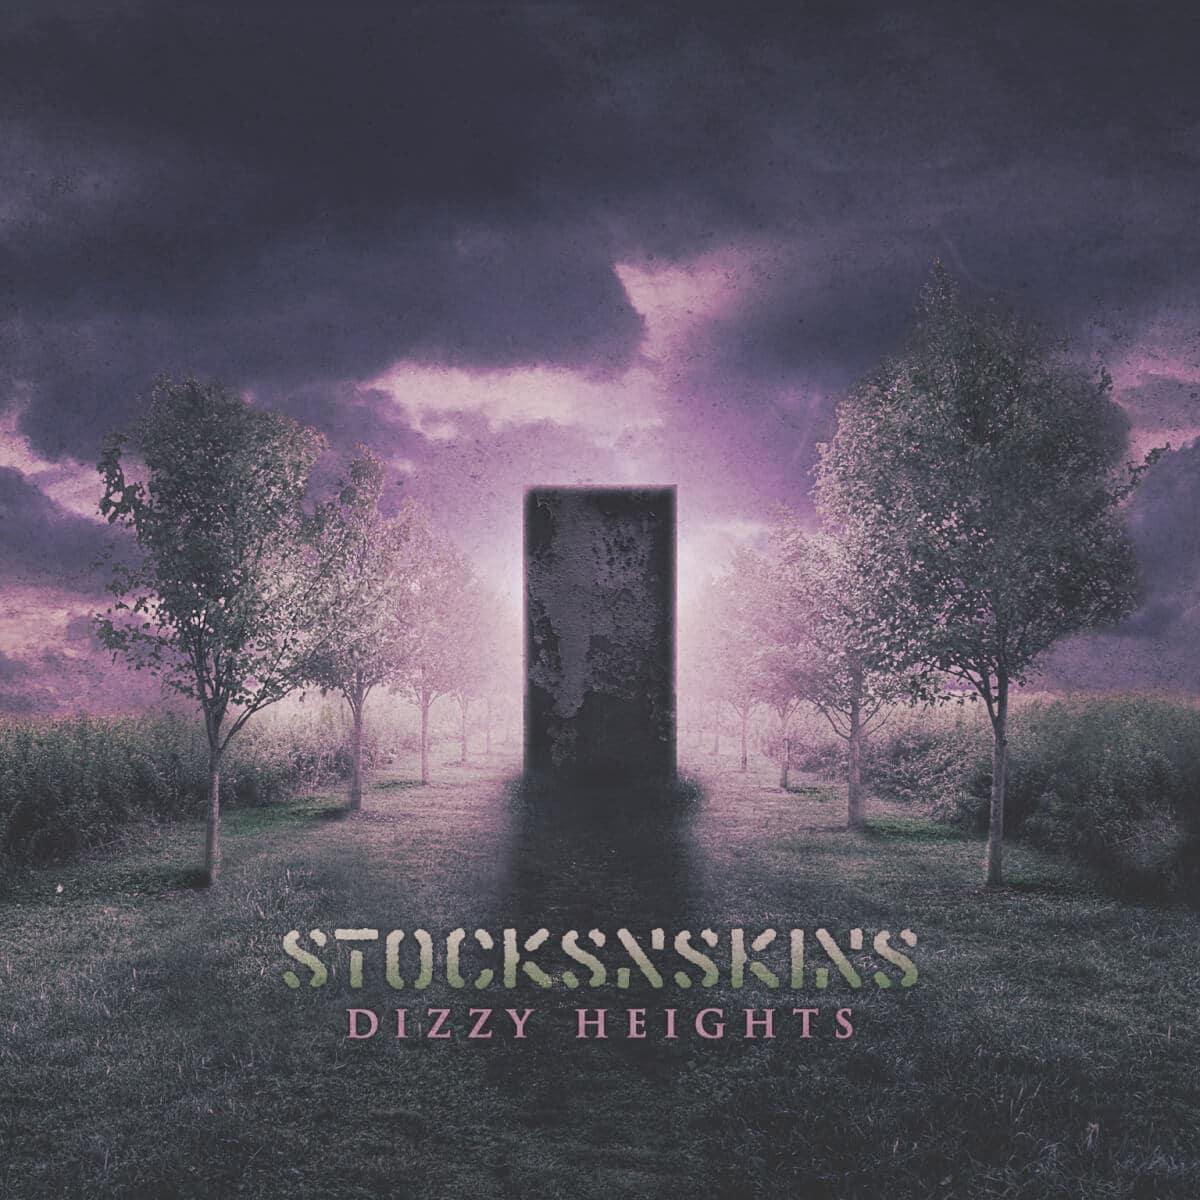 Stocksnskins – Dizzy Heights